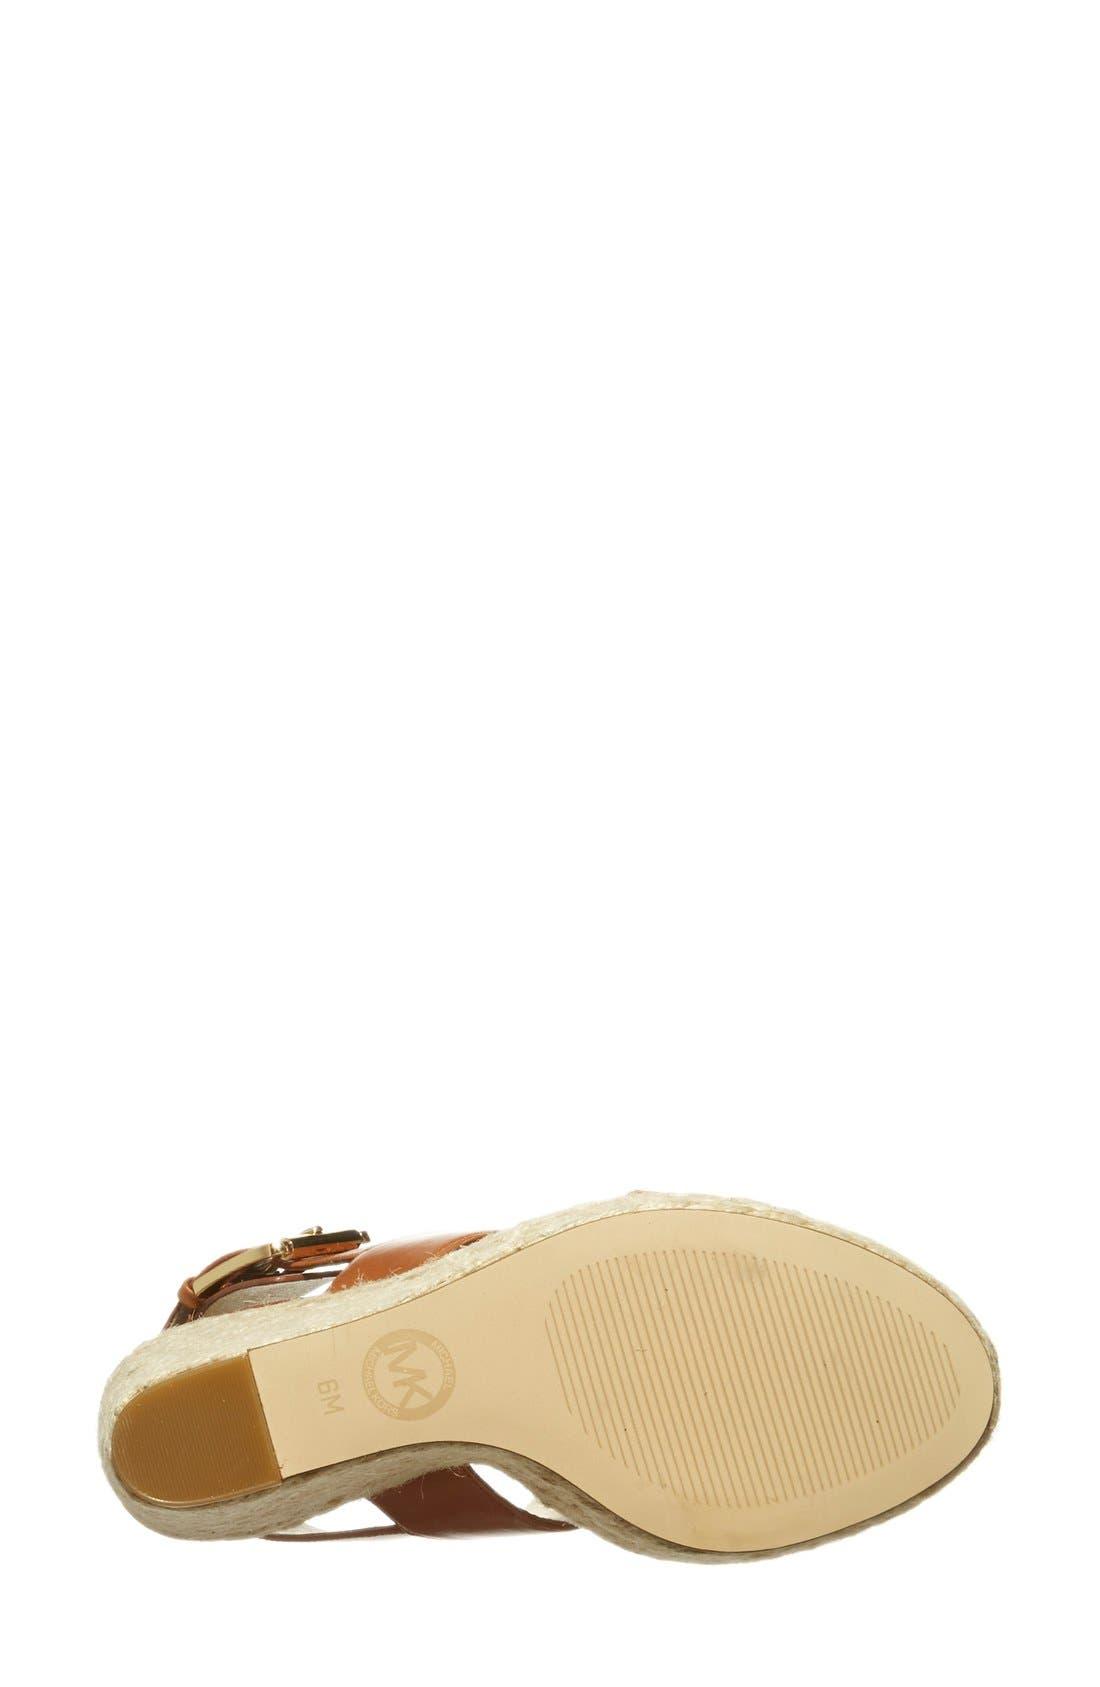 'Posey' Espadrille Wedge Sandal,                             Alternate thumbnail 4, color,                             Luggage